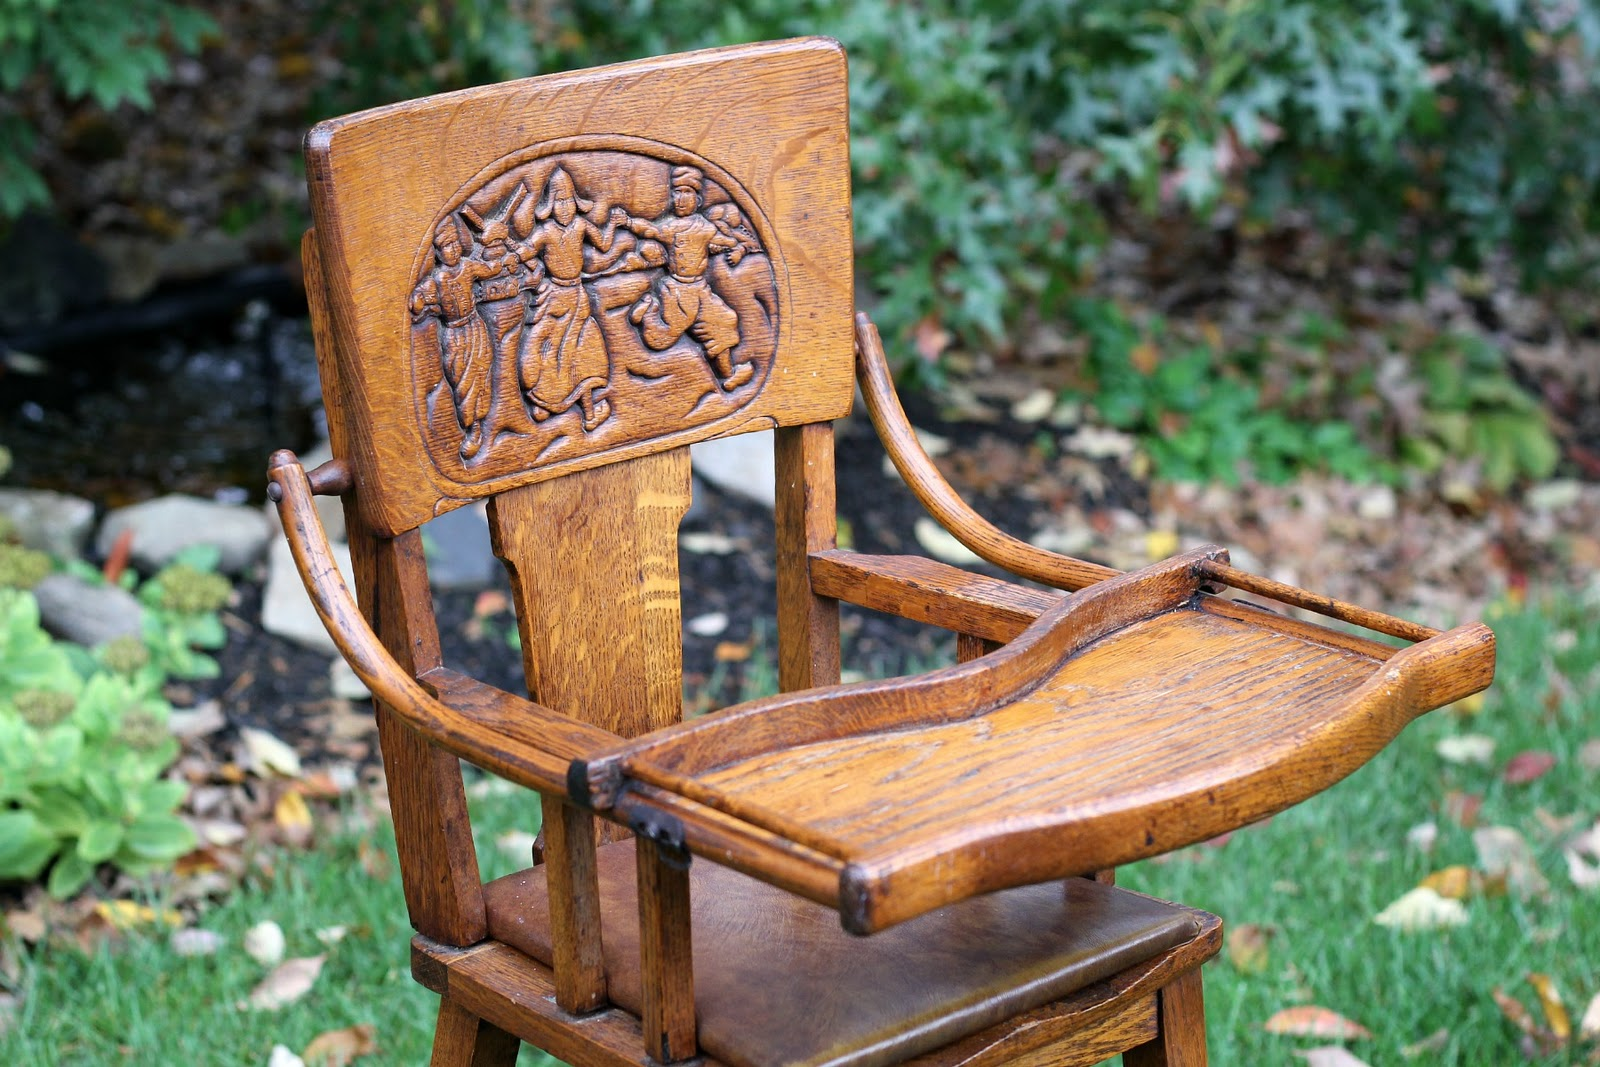 Antique high chair grateful prayer thankful heart for Antique high chairs